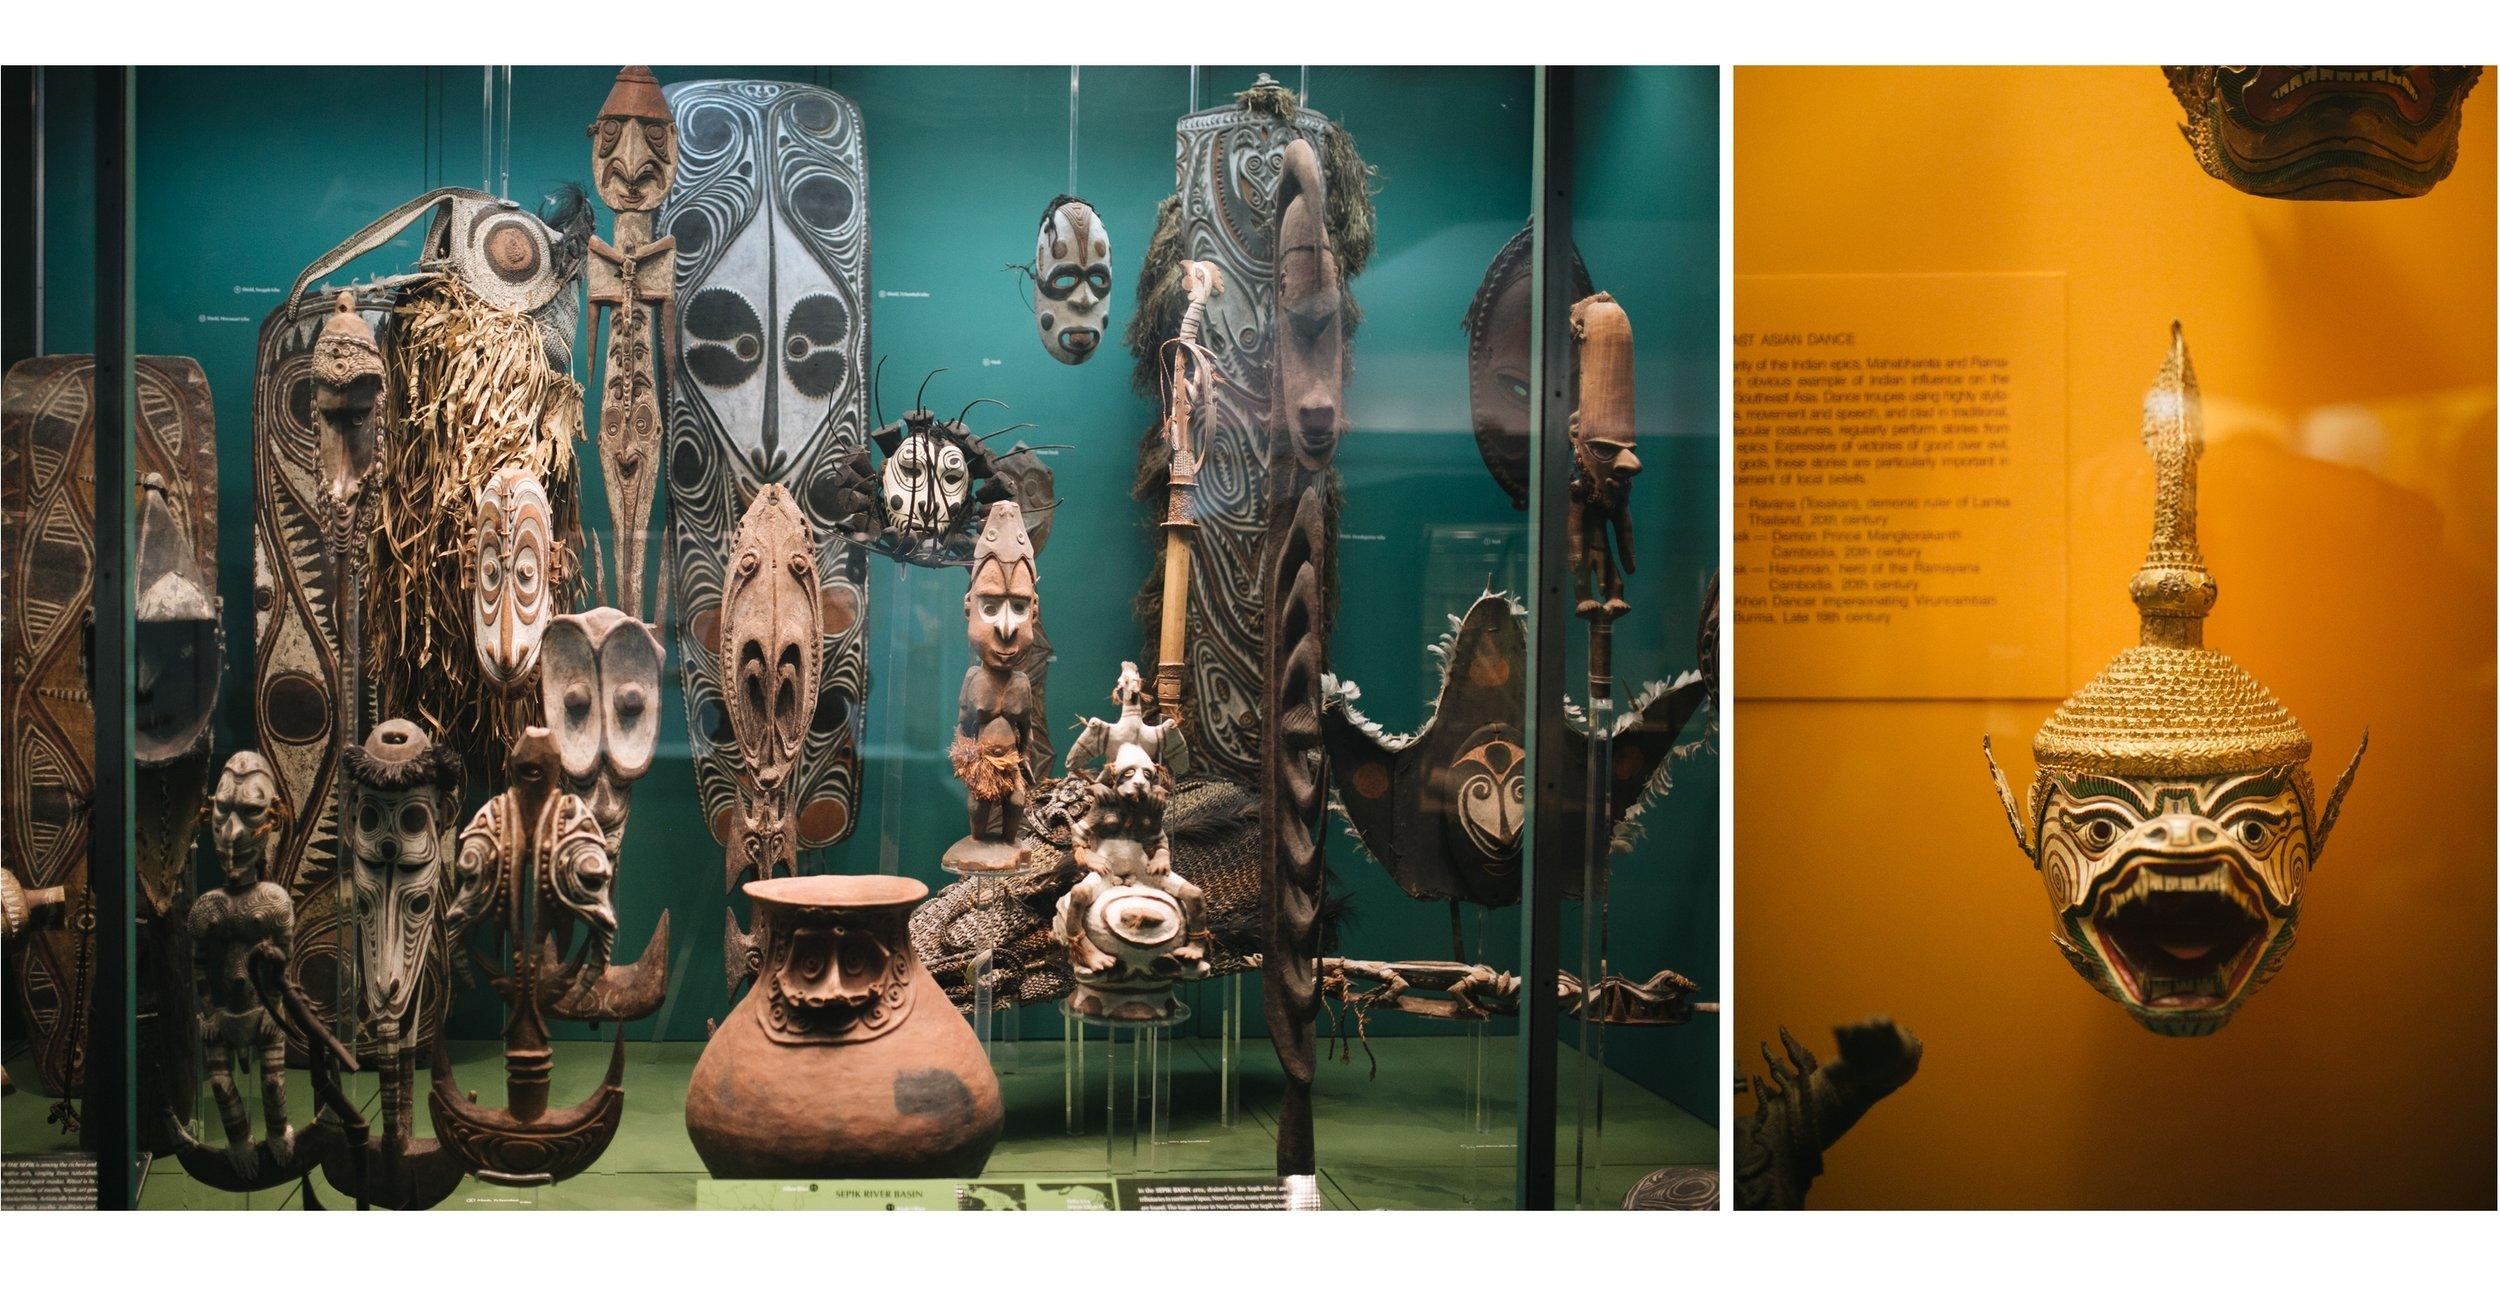 american natural history museum - newyork-city onmyway.jpg